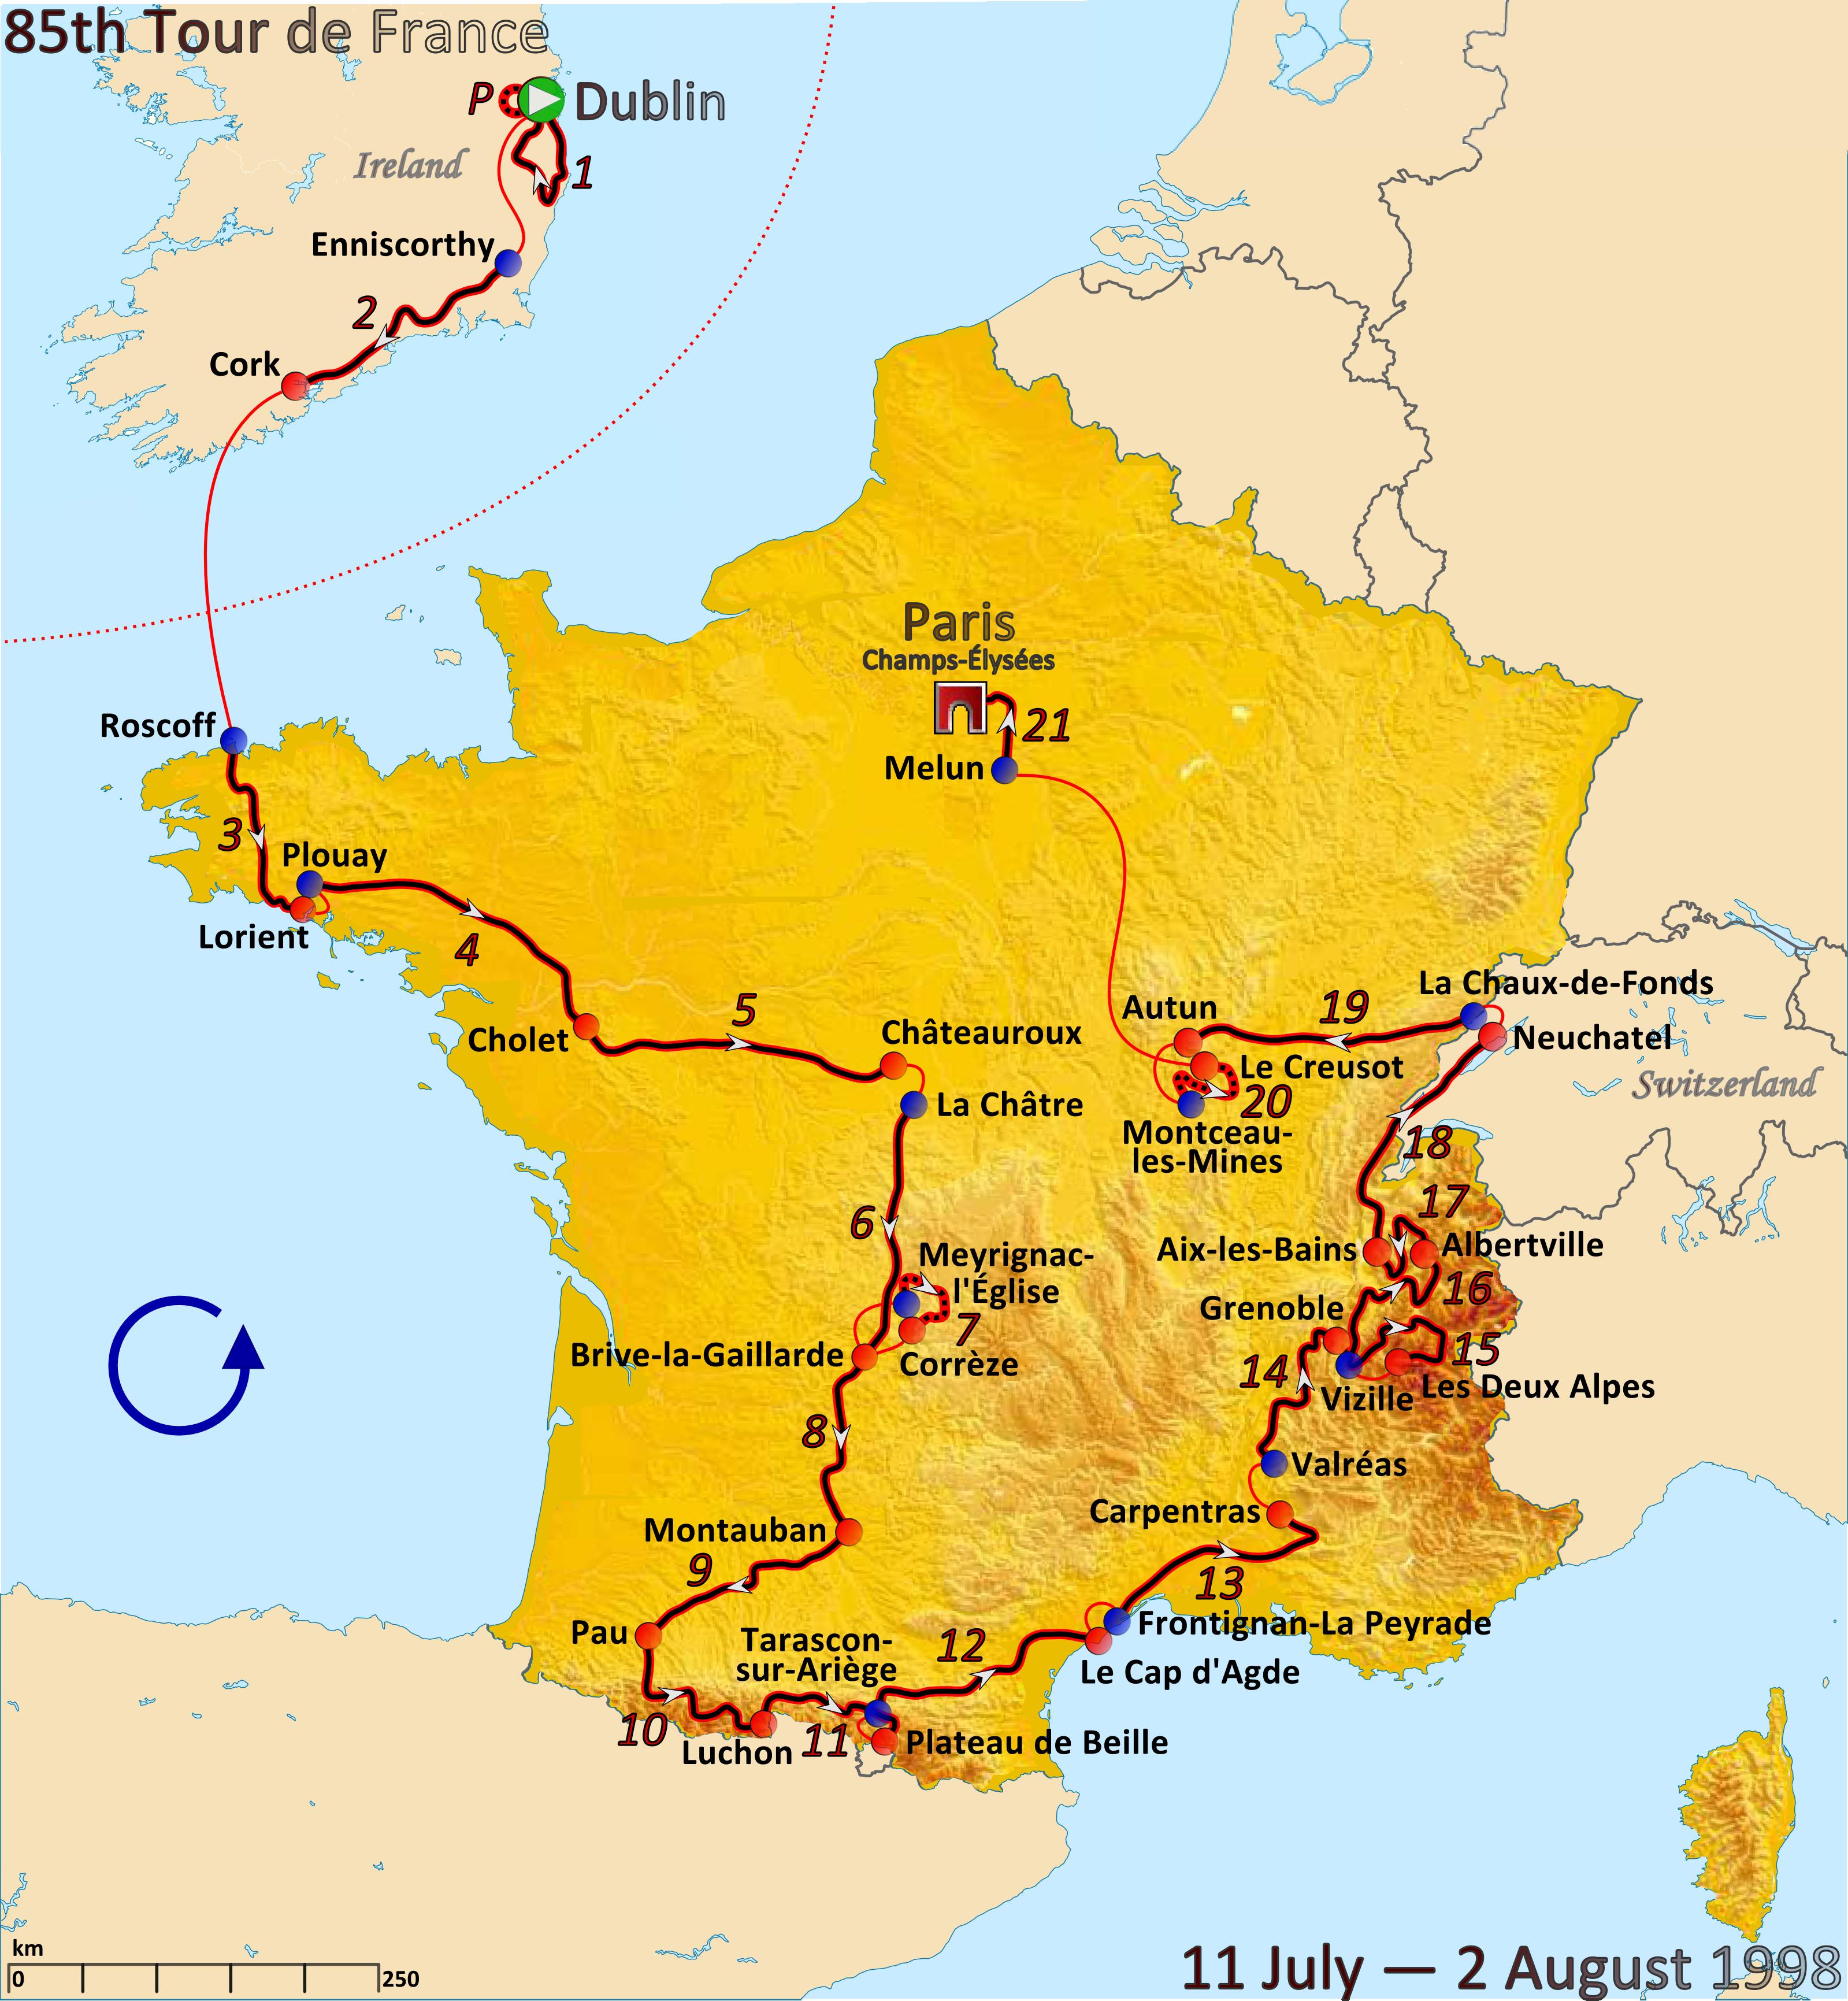 1998 tour de france - wikipedia